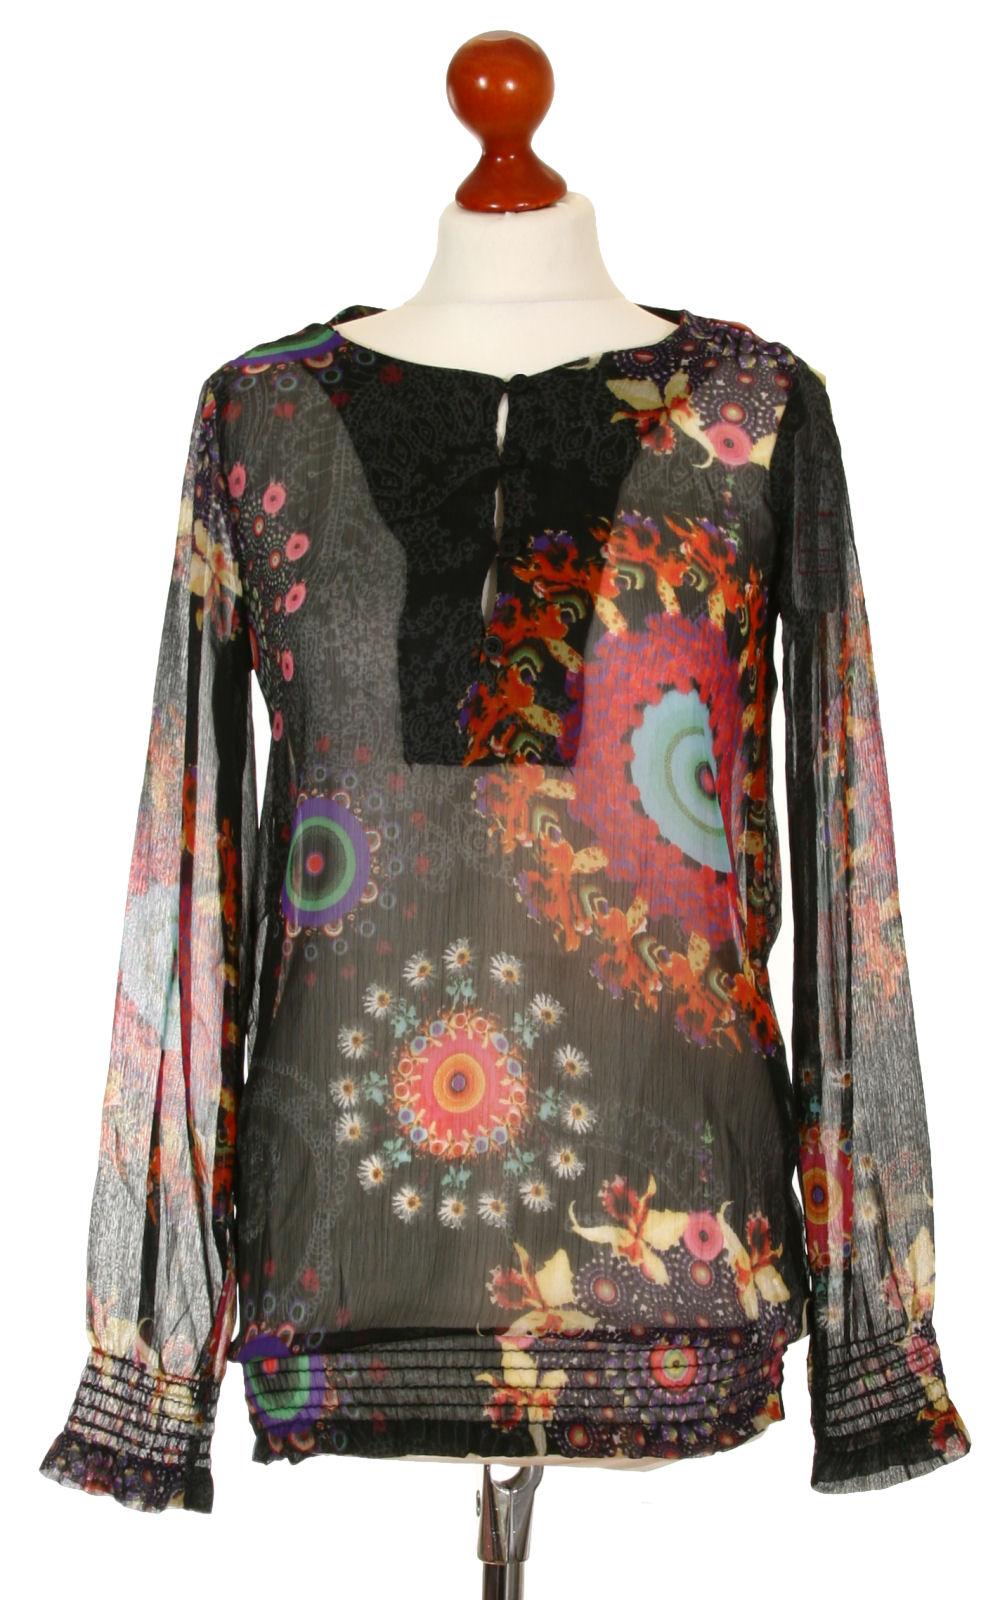 6f3b824cc7e7 Outlet ruha   Női Blúz hosszú, Desigual, Méret: S, Outlet   http ...